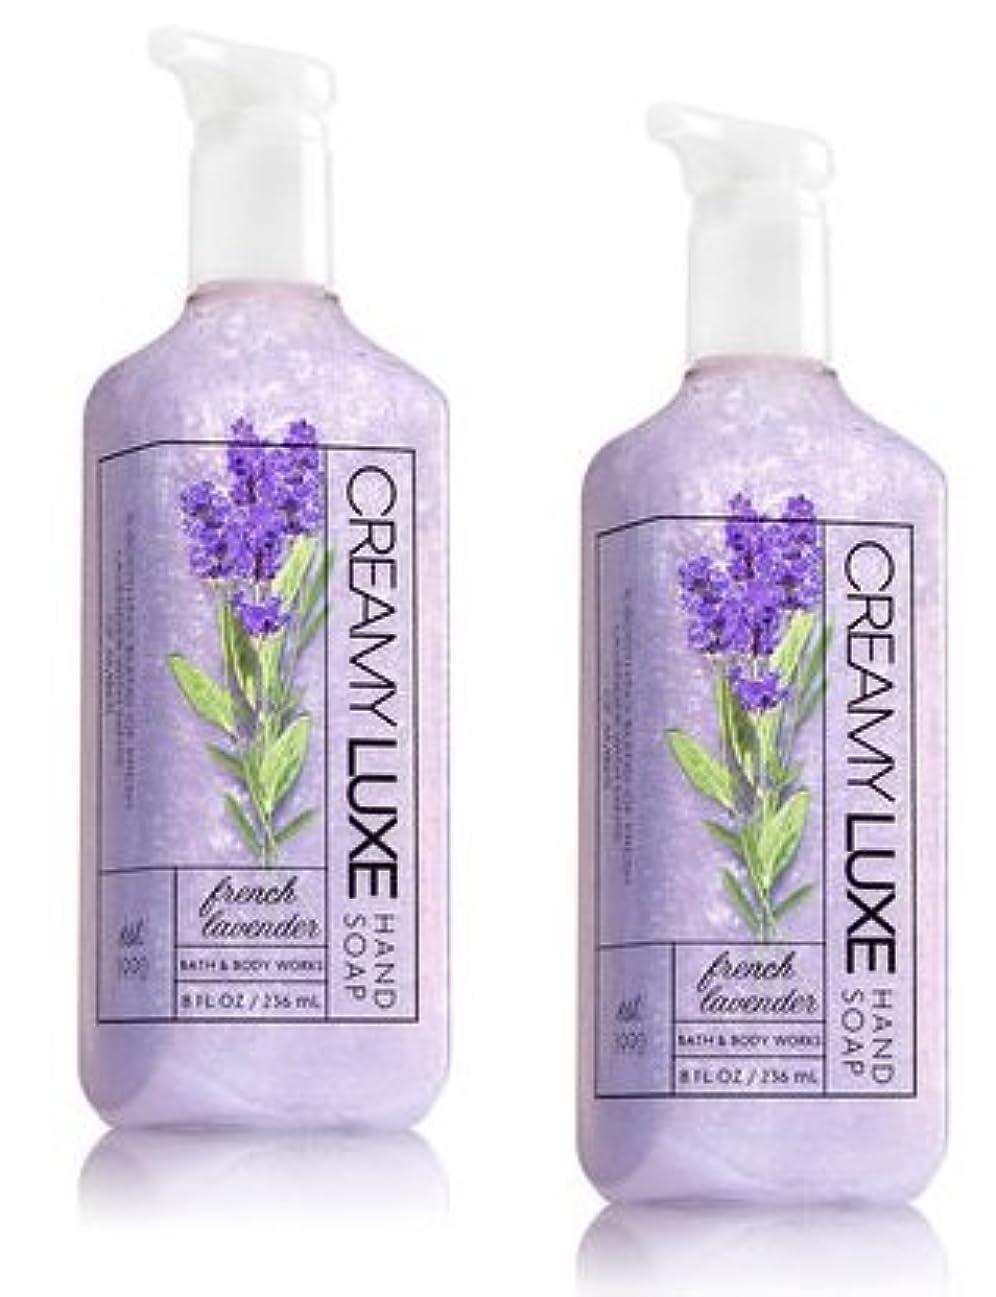 Bath & Body Works フレンチラベンダー クリーミー リュクス ハンドソープ 2本セット French Lavender Creamy Luxe Hand Soap. 8 oz [並行輸入品]